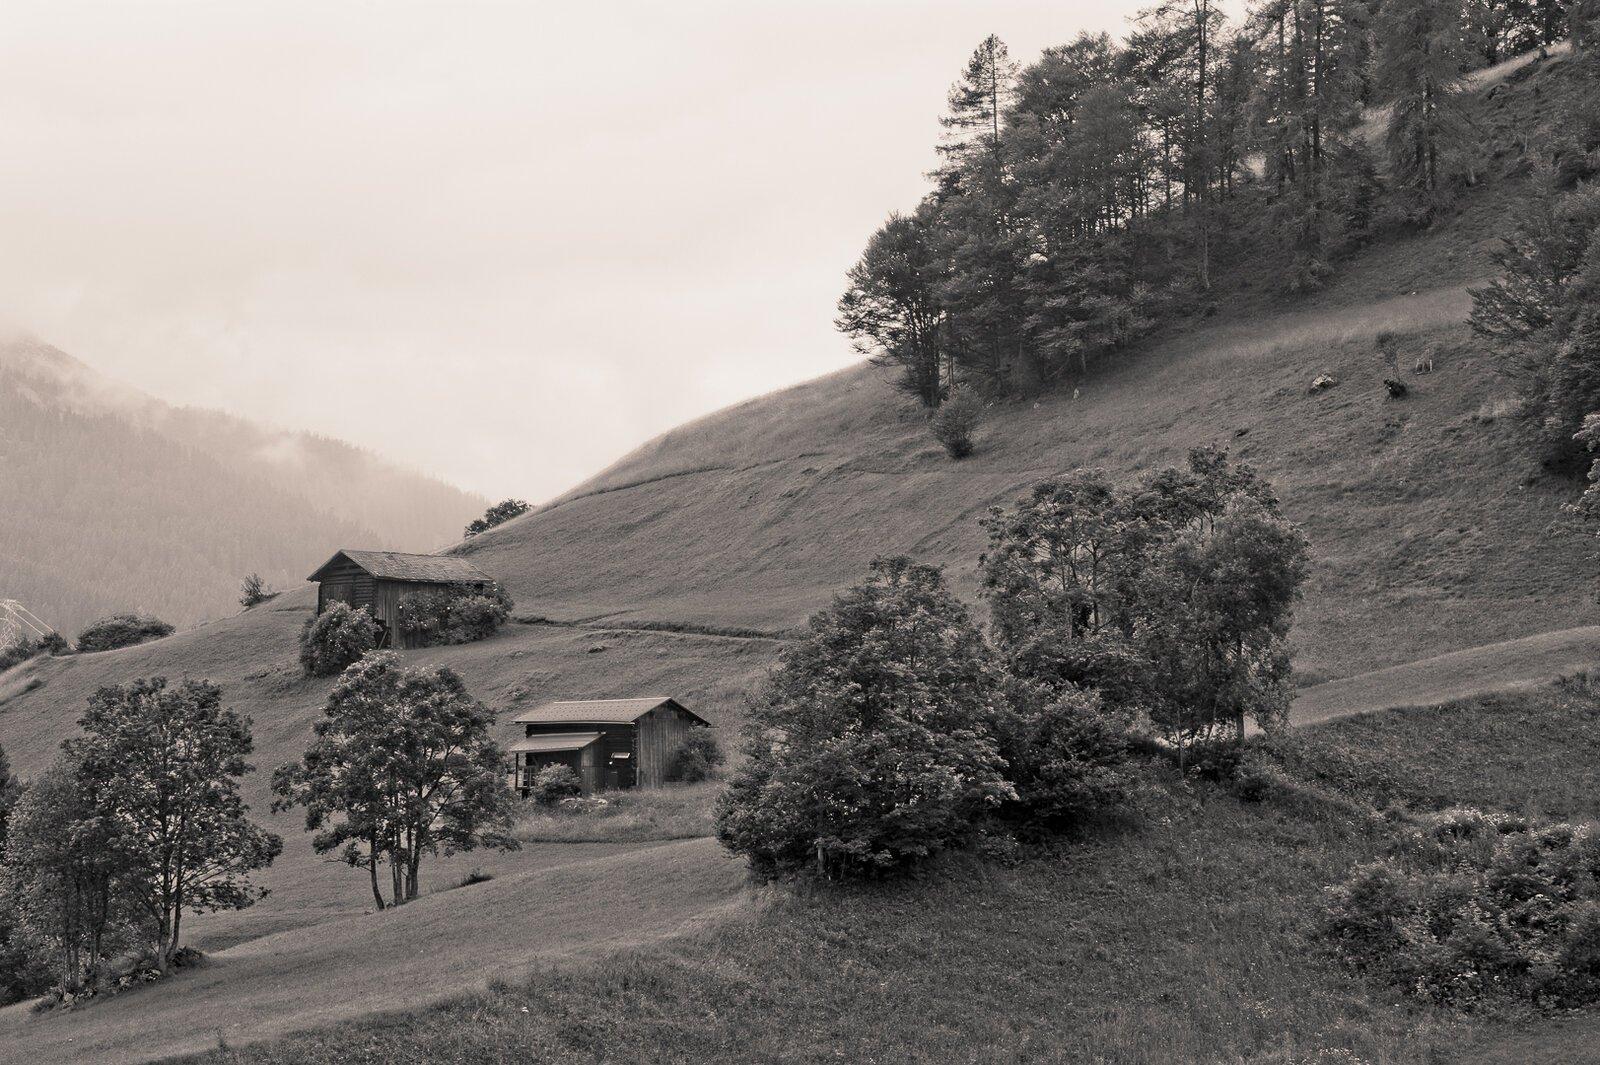 2012-Klosters_2012-07-11_15-01-50_00381_DxO_2.jpg